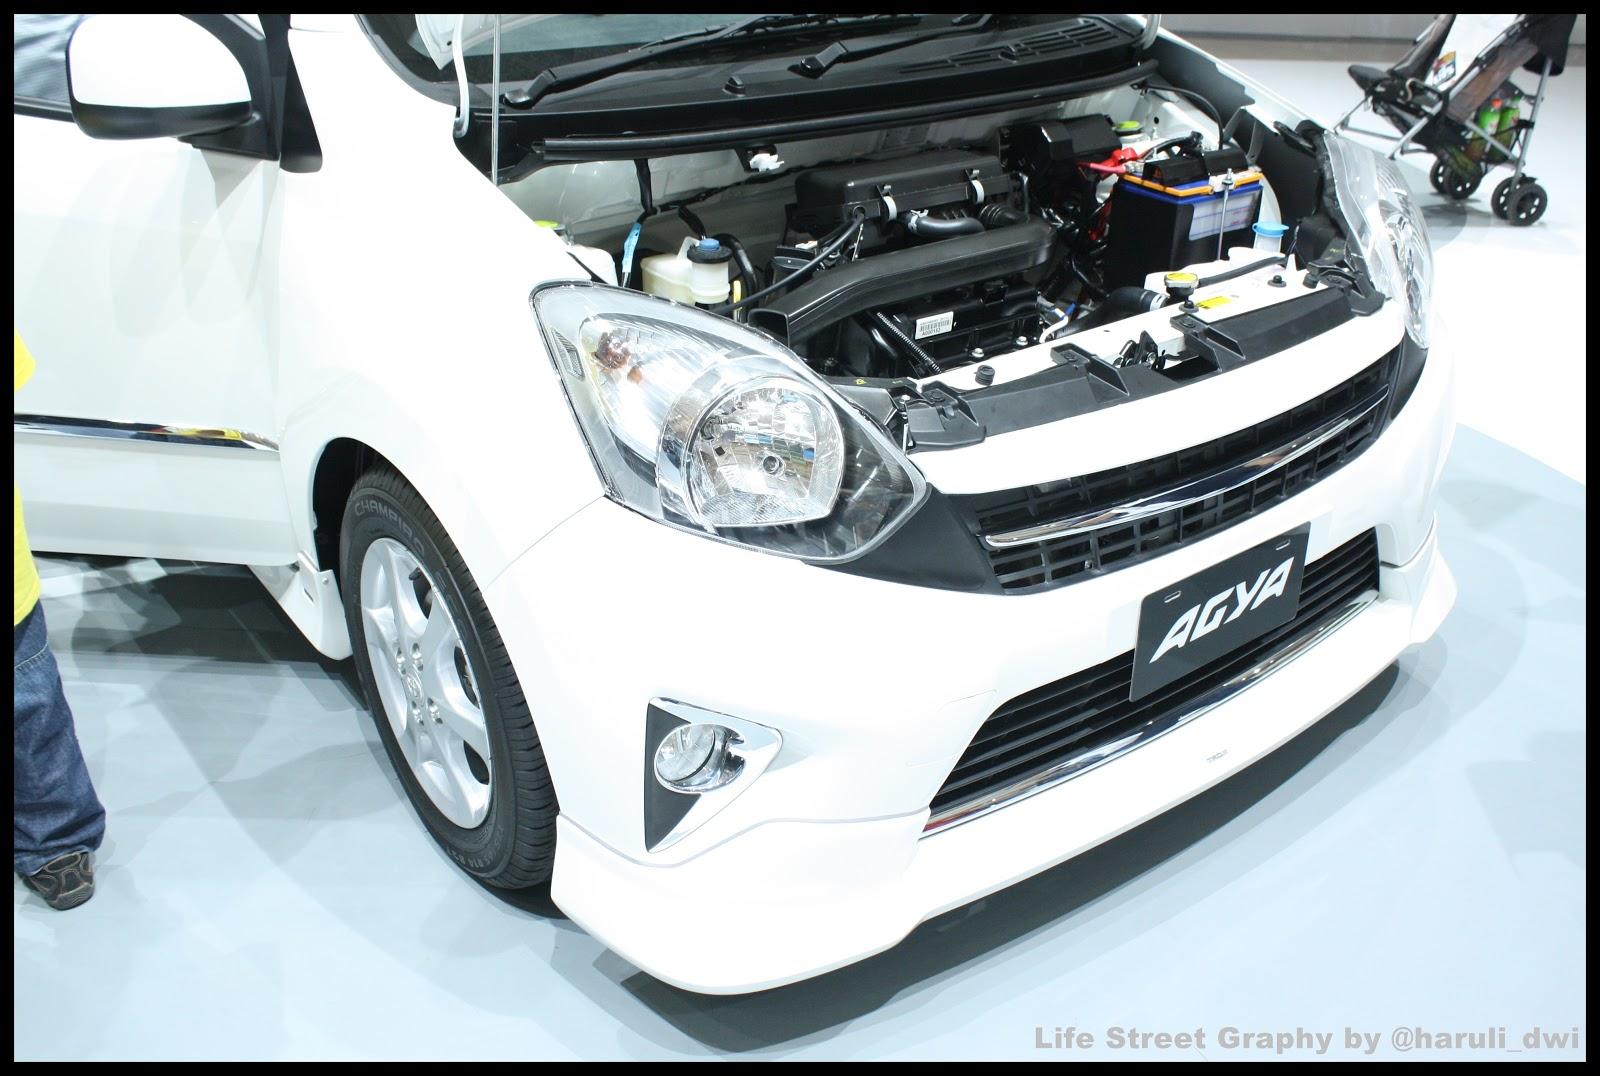 New Agya Trd Sportivo Olx Grand Avanza 2016 Iims 2012 Toyota Section Life Street Graphy